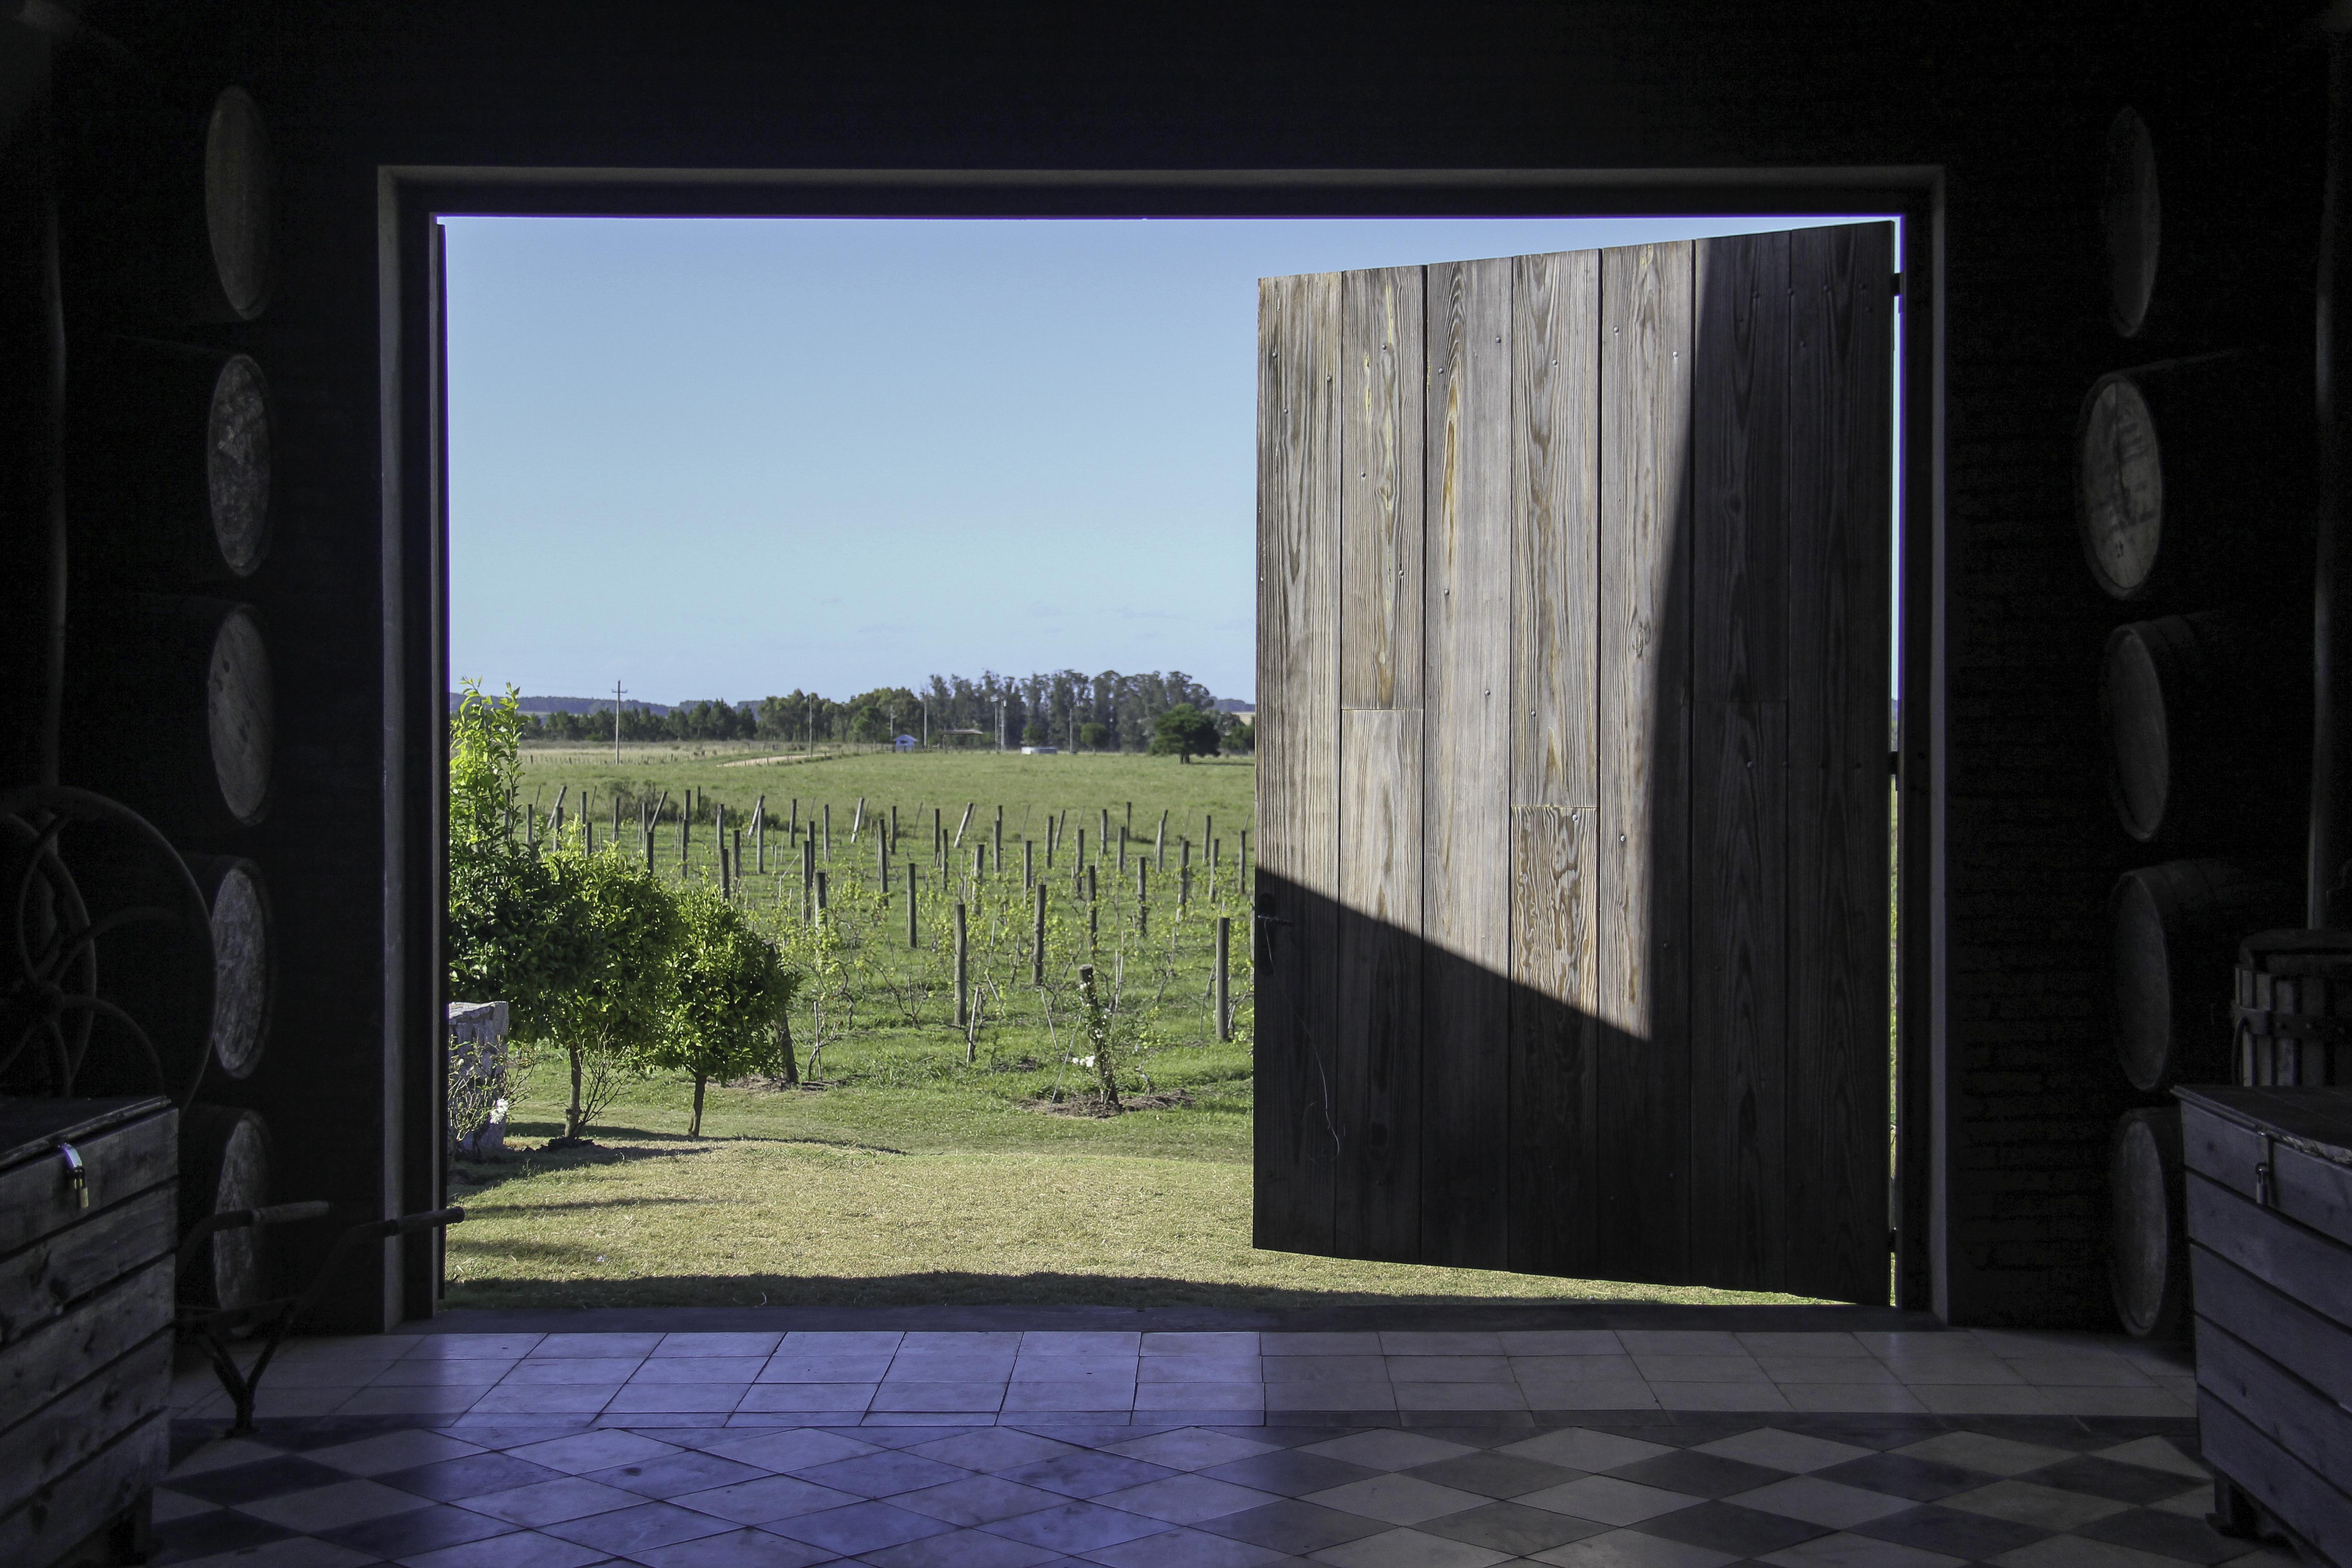 Bodega, Uruguai / Winery, Uruguay